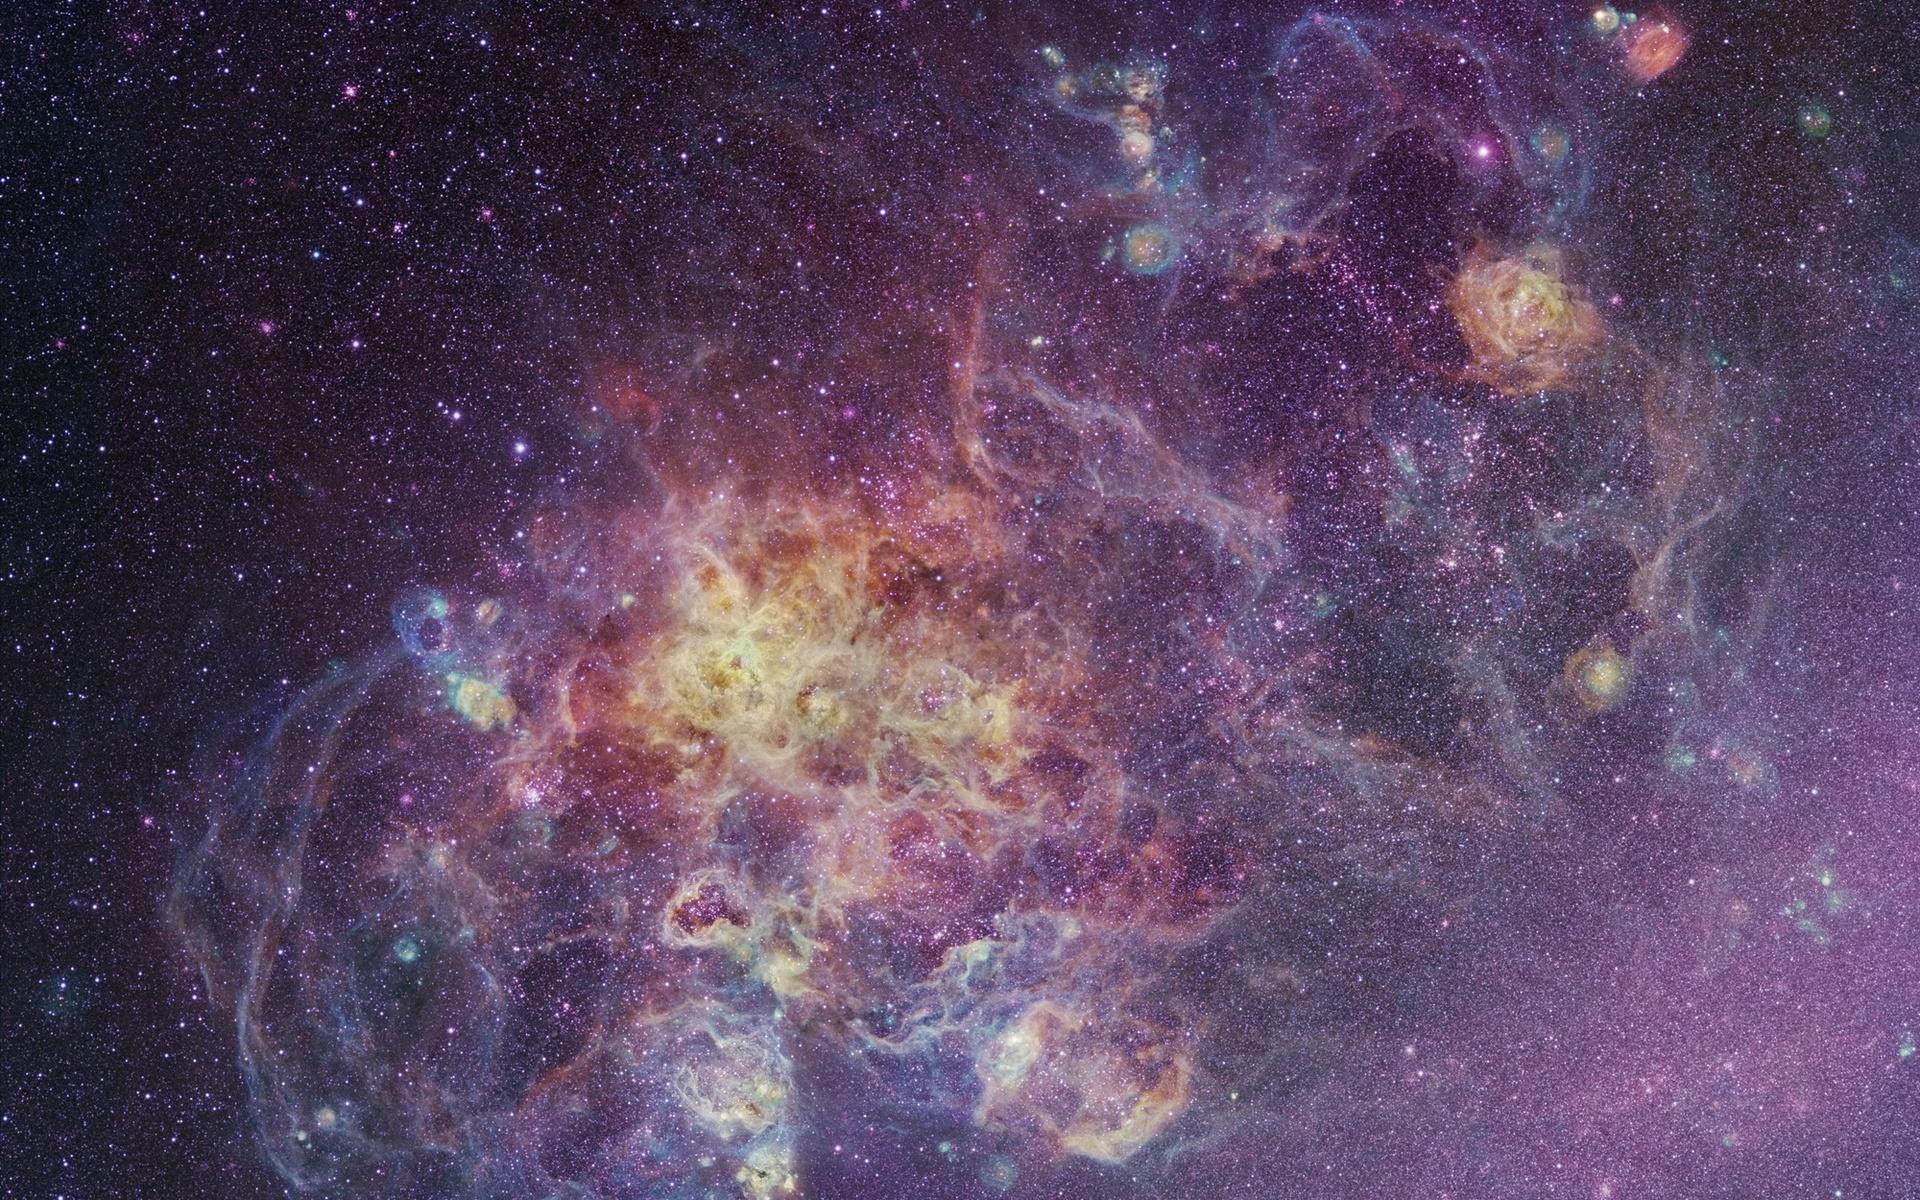 Nebula stars star space wallpaper   1920x1200   84823 ...